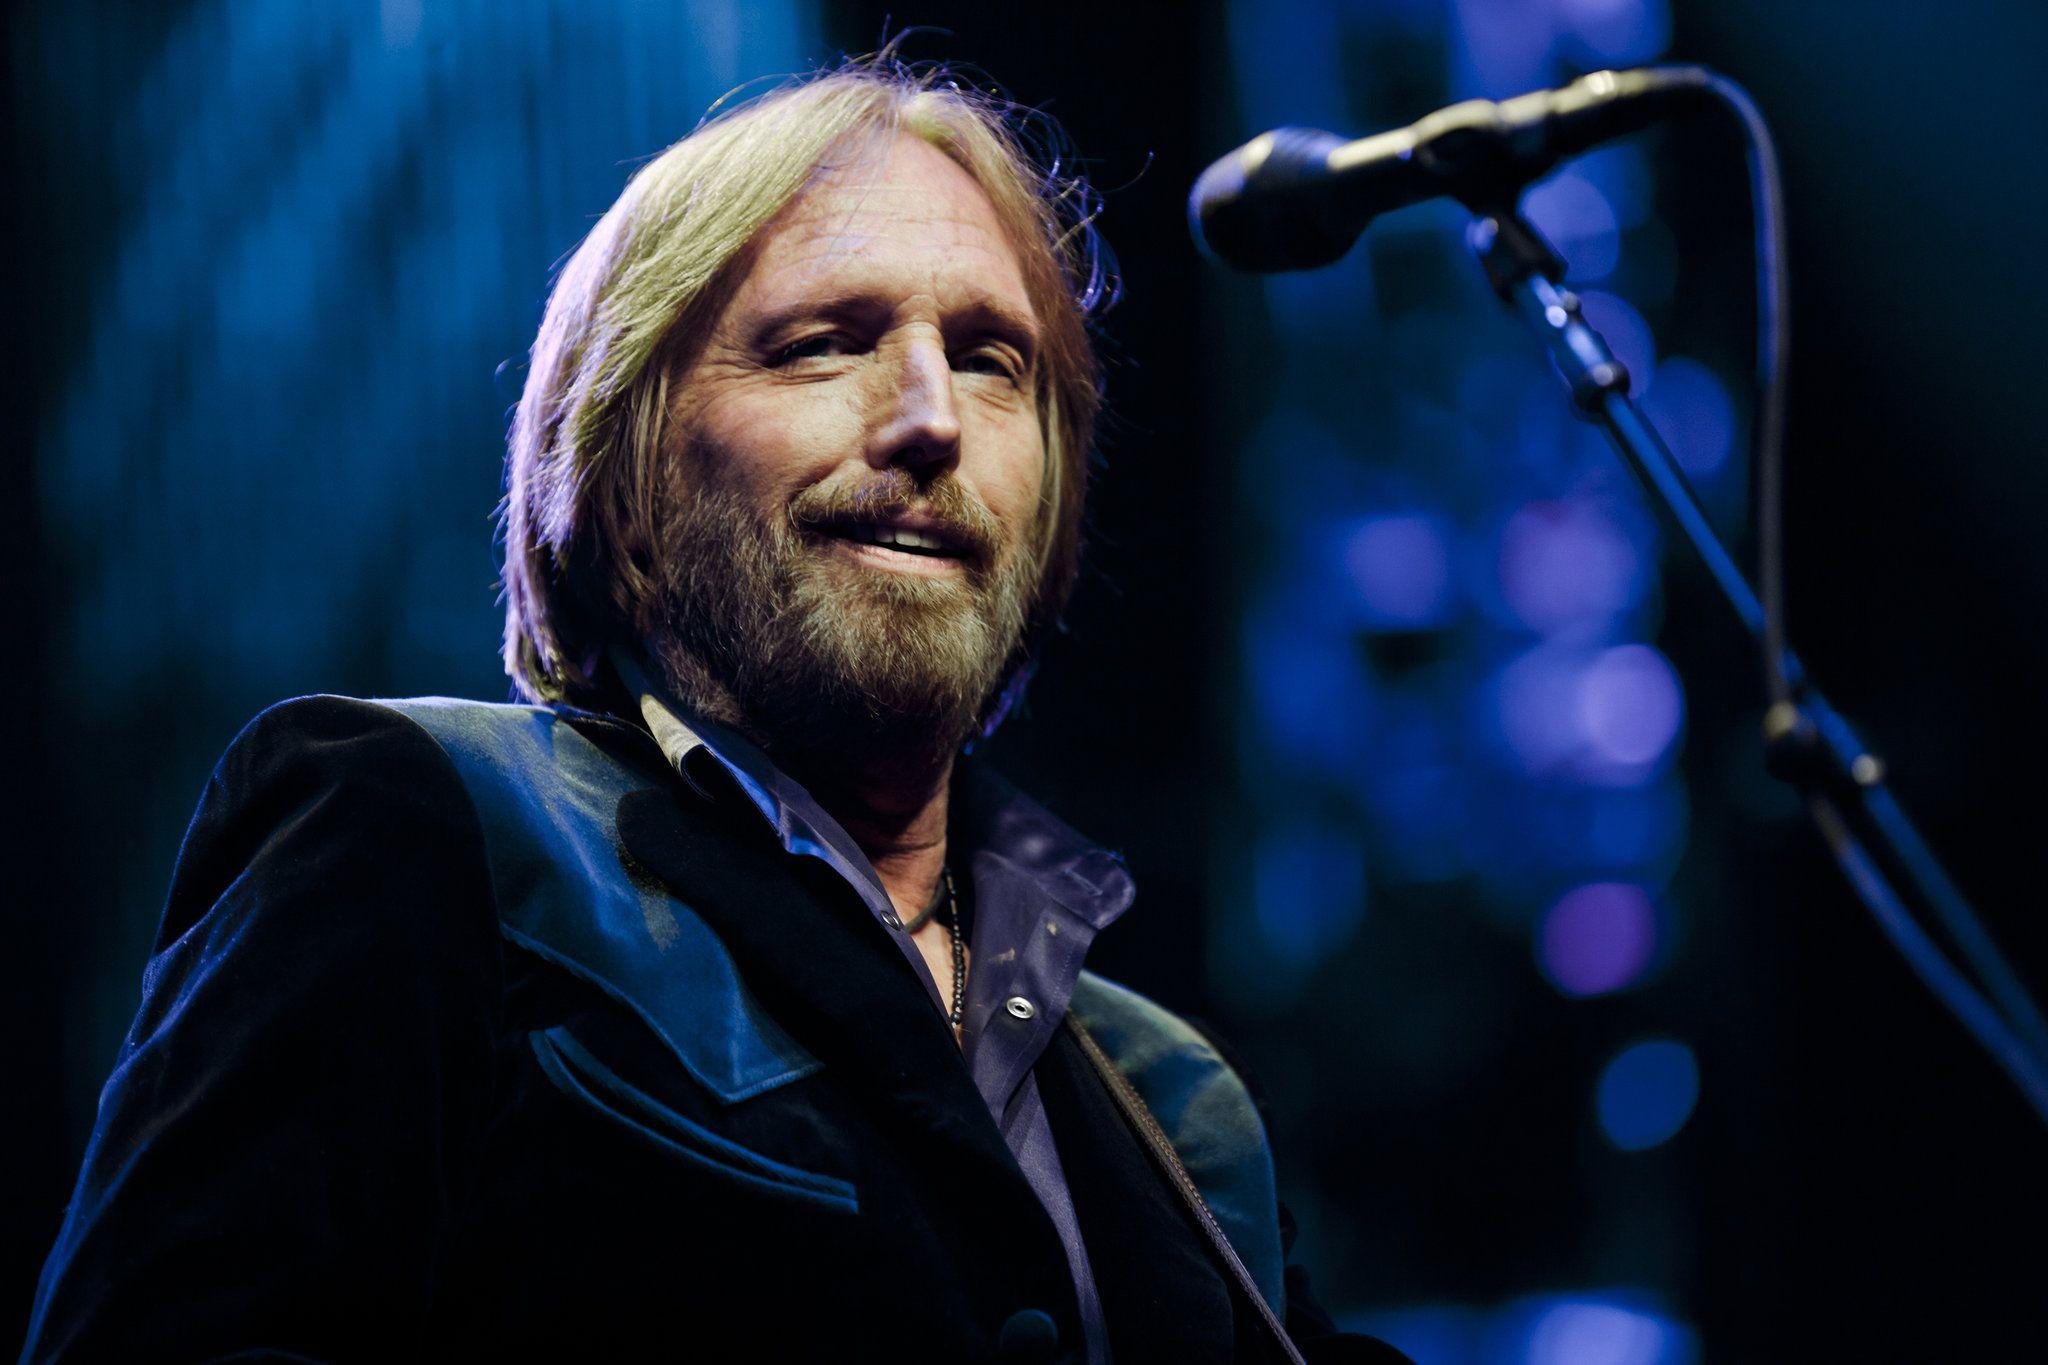 Murió el músico Tom Petty